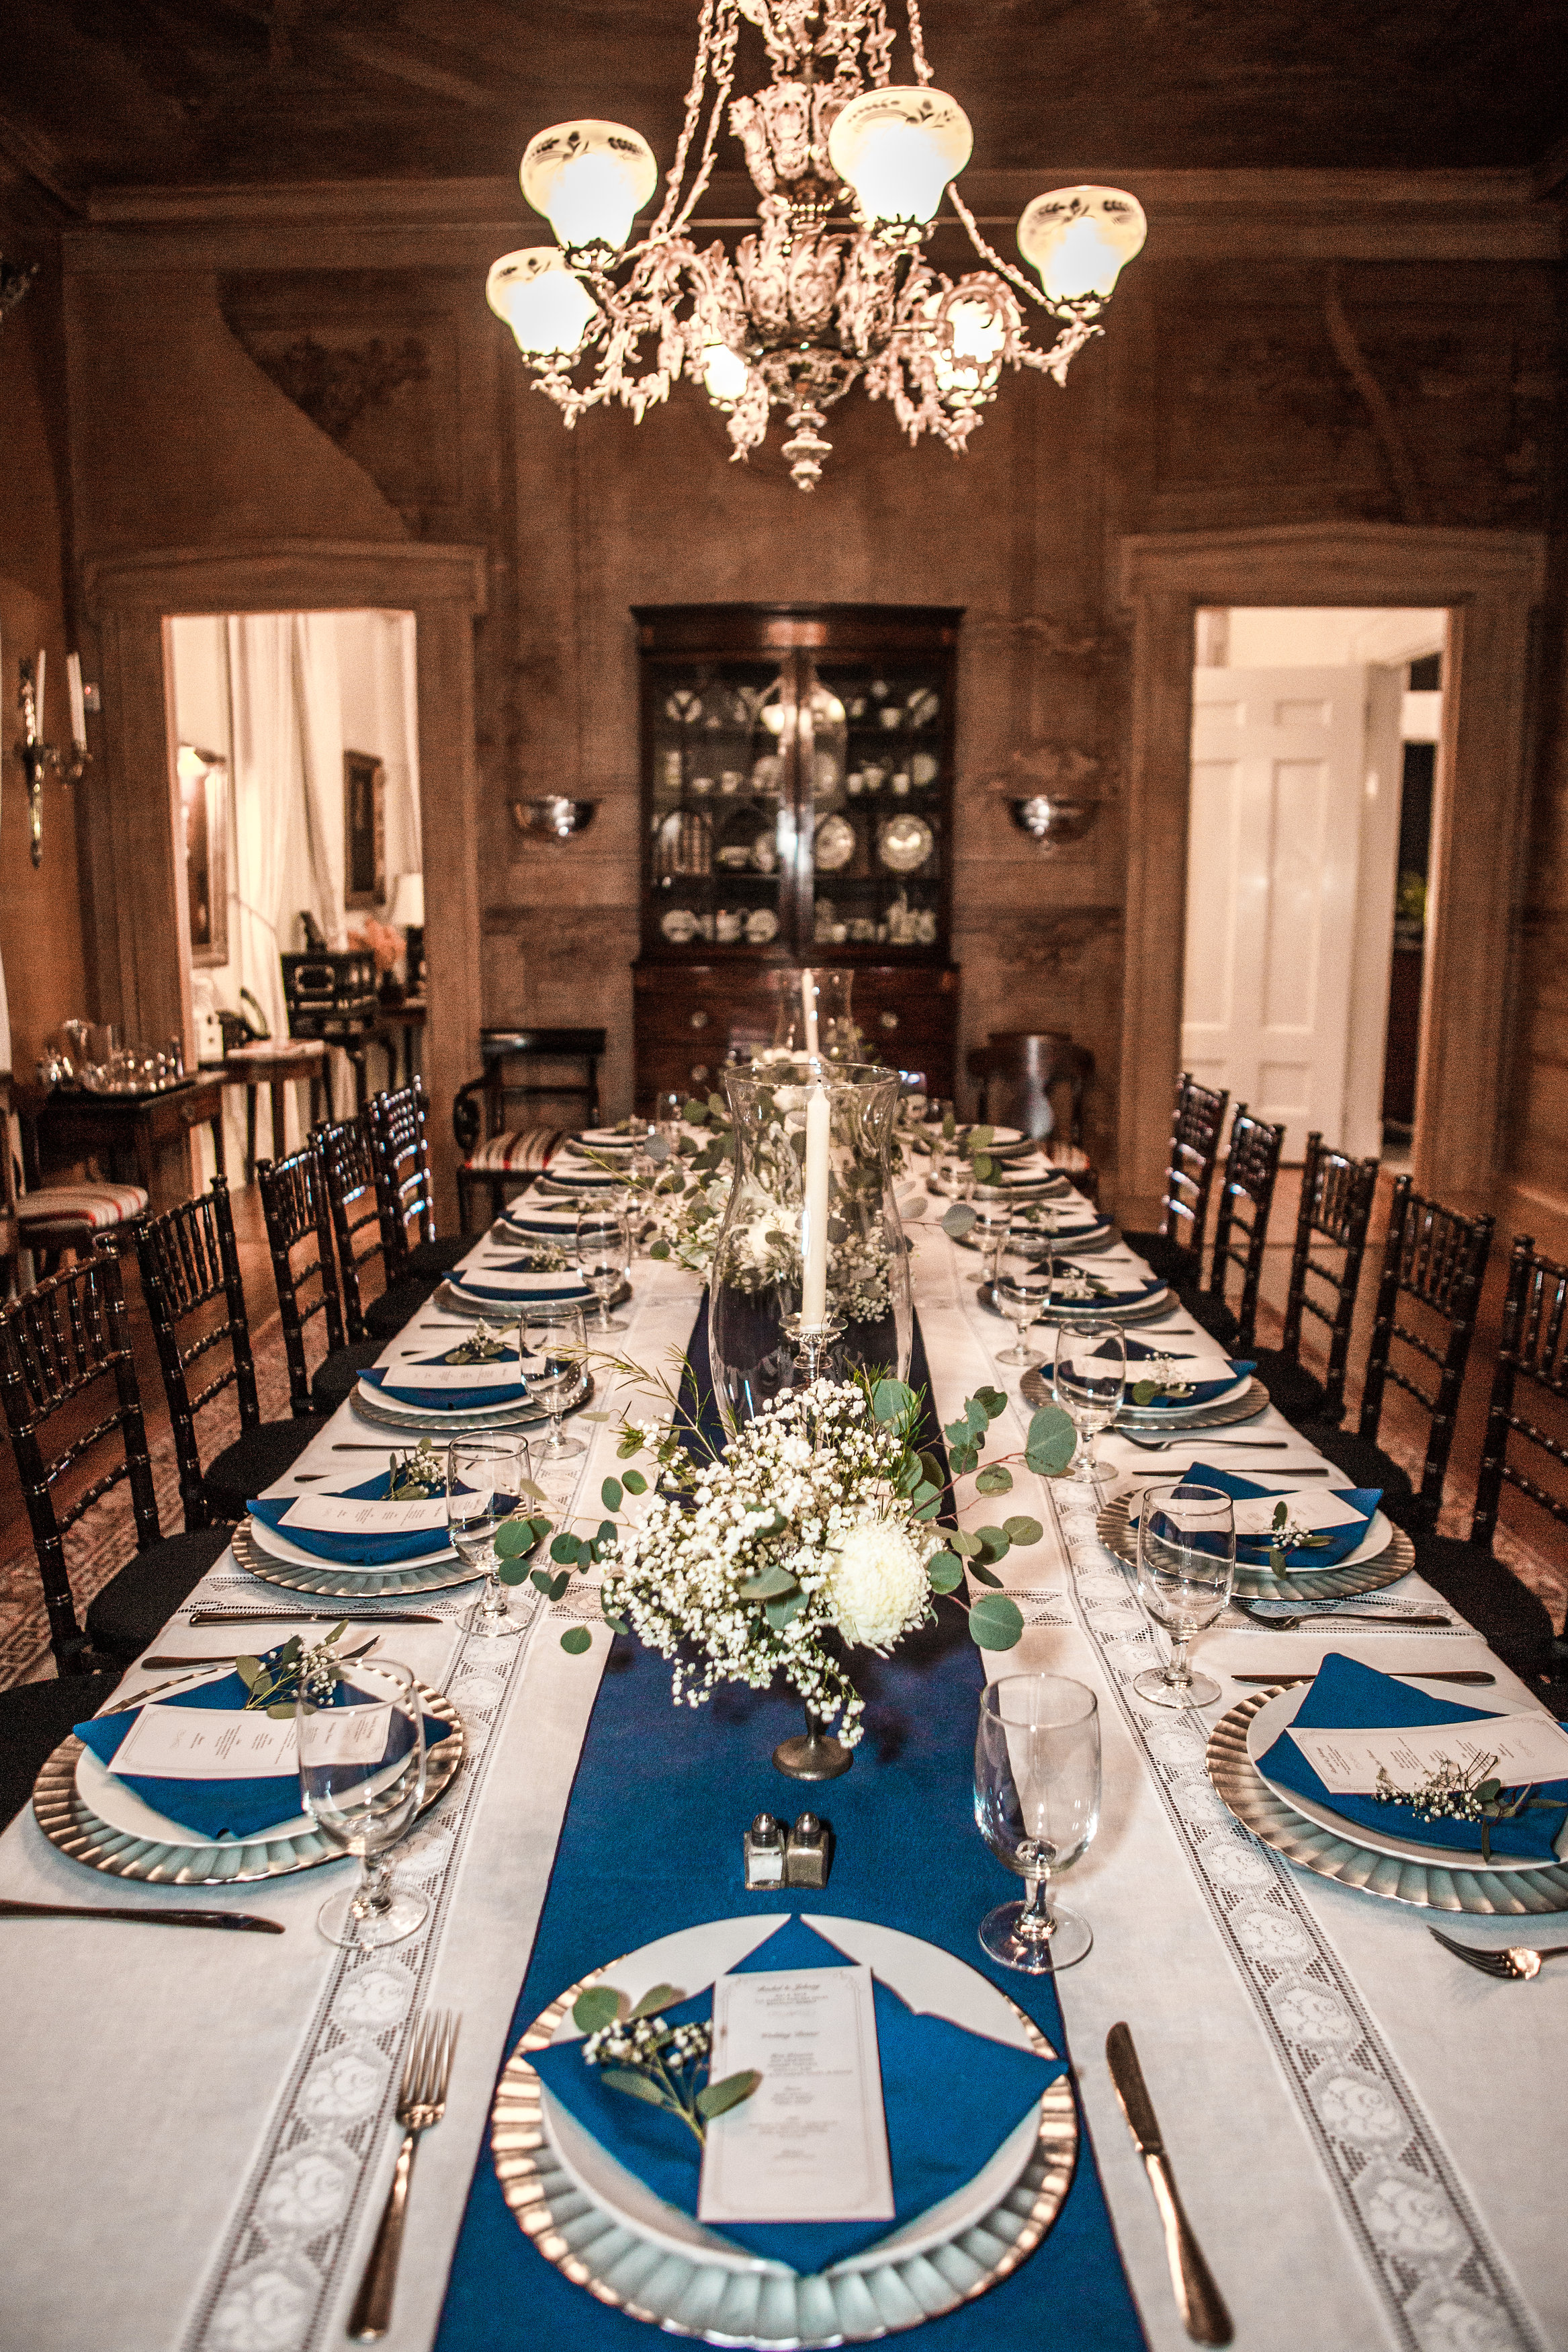 harper-fowlkes-house-wedding-ivory-and-beau-savannah-wedding-planner-savannah-event-designer-intimate-destination-wedding-savannah-best-wedding-planner.jpg